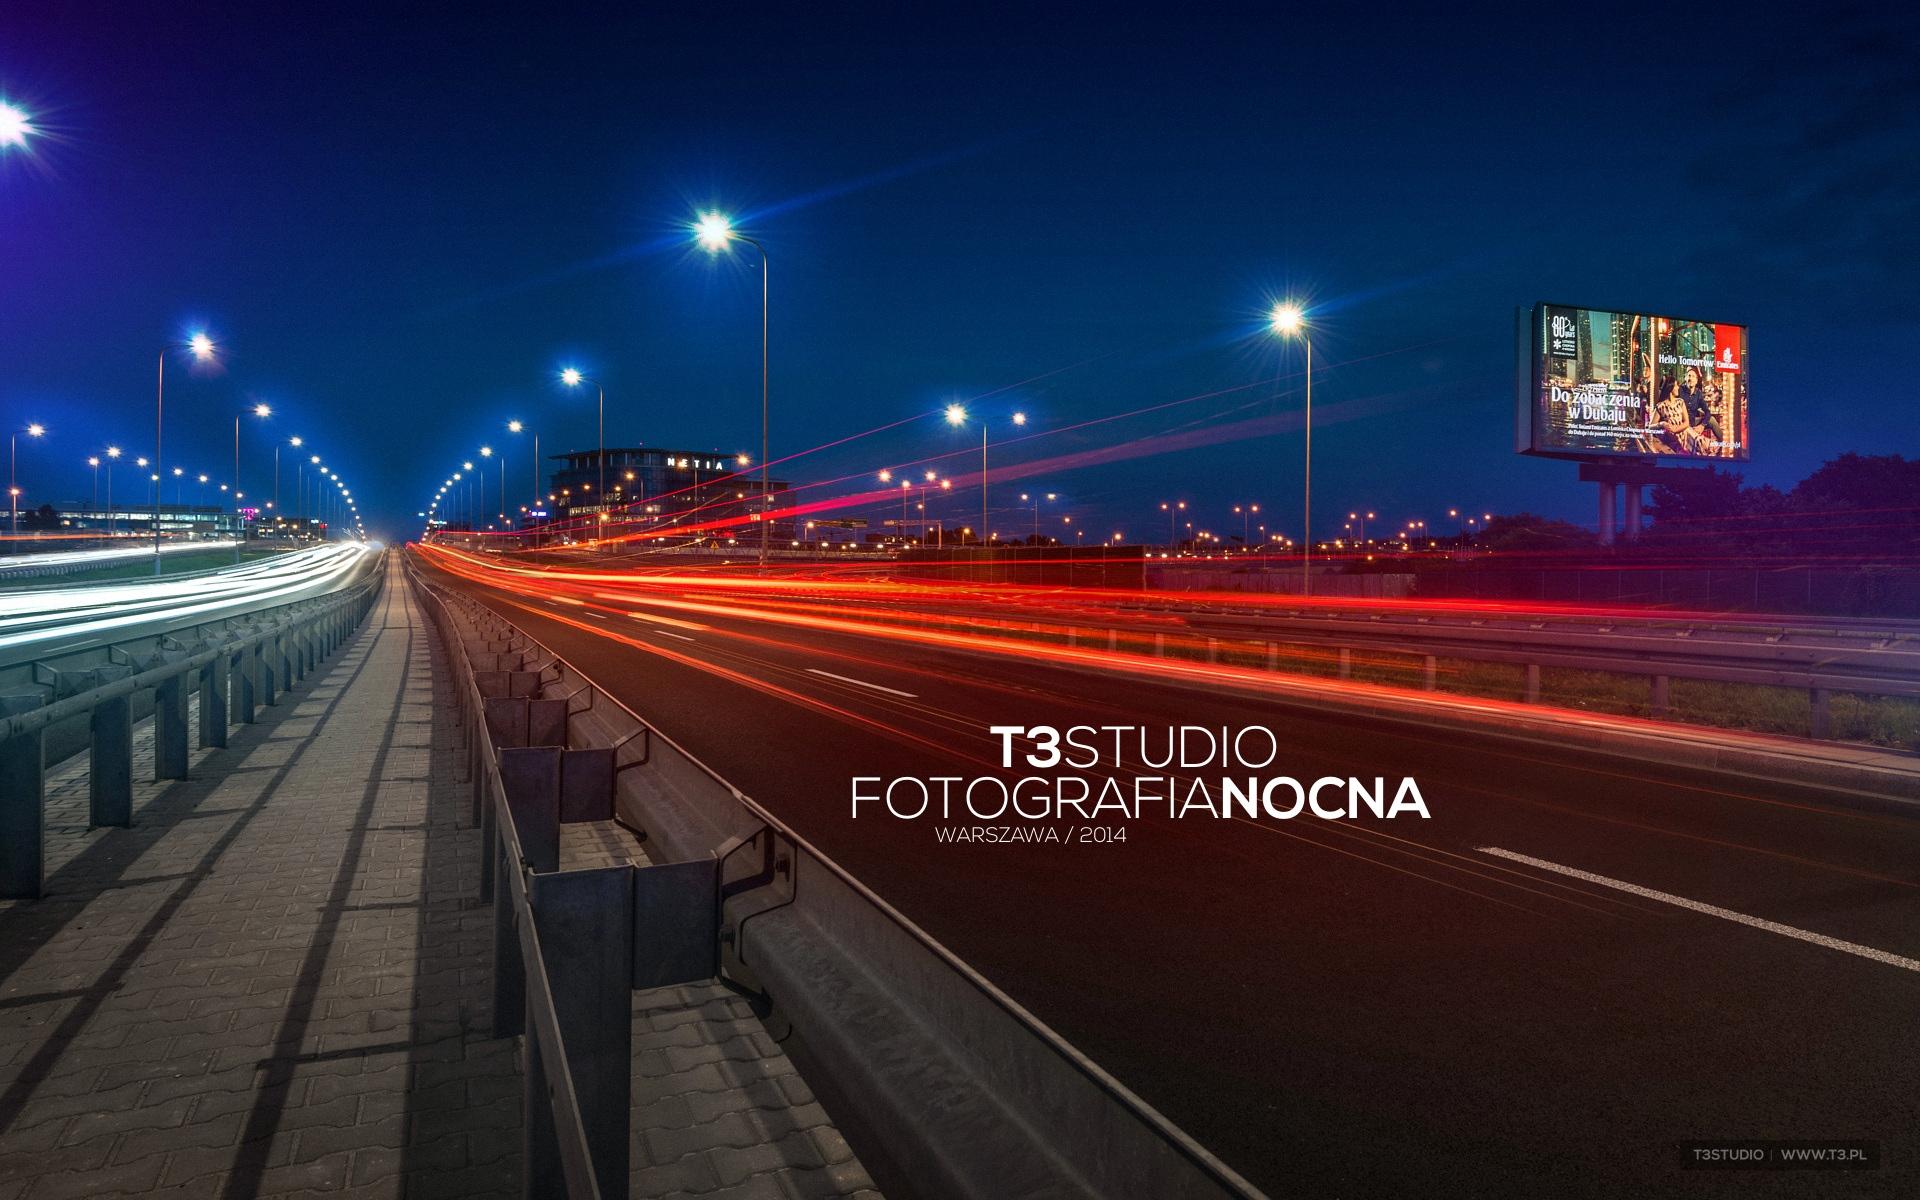 T3Studio - Fotografia nocna - Warszawa 2014